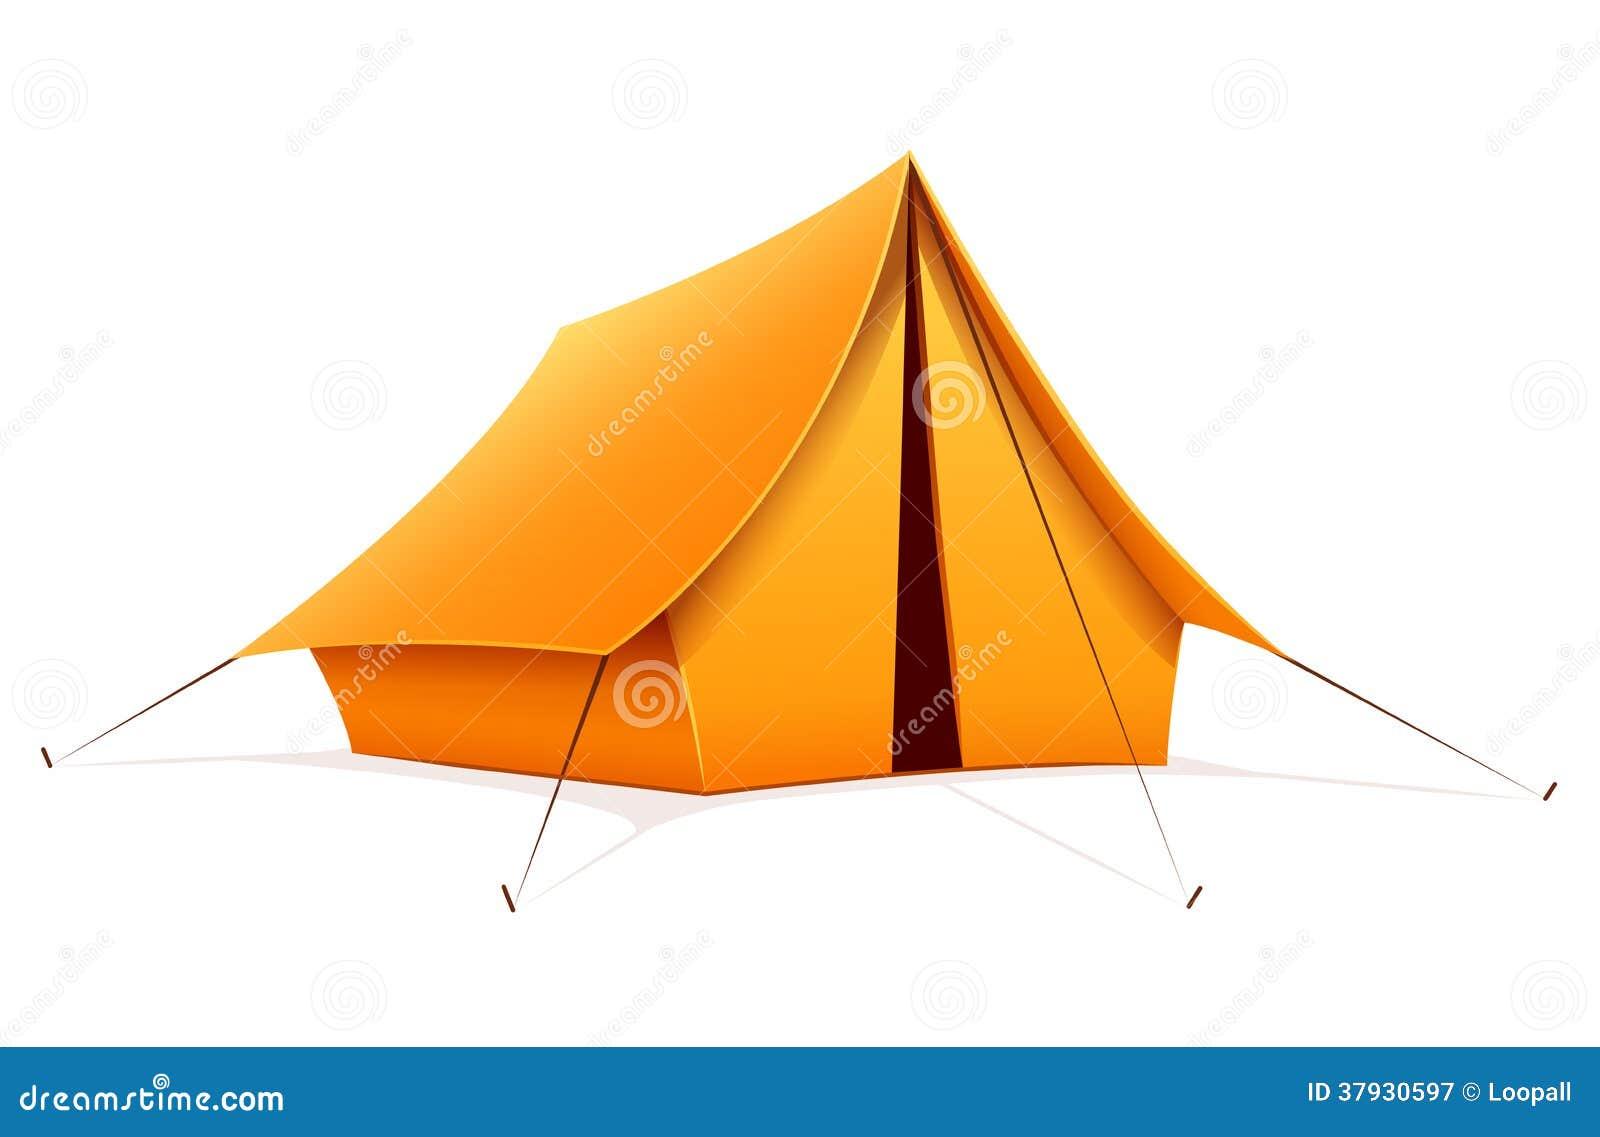 Touristic располагаясь лагерем шатер